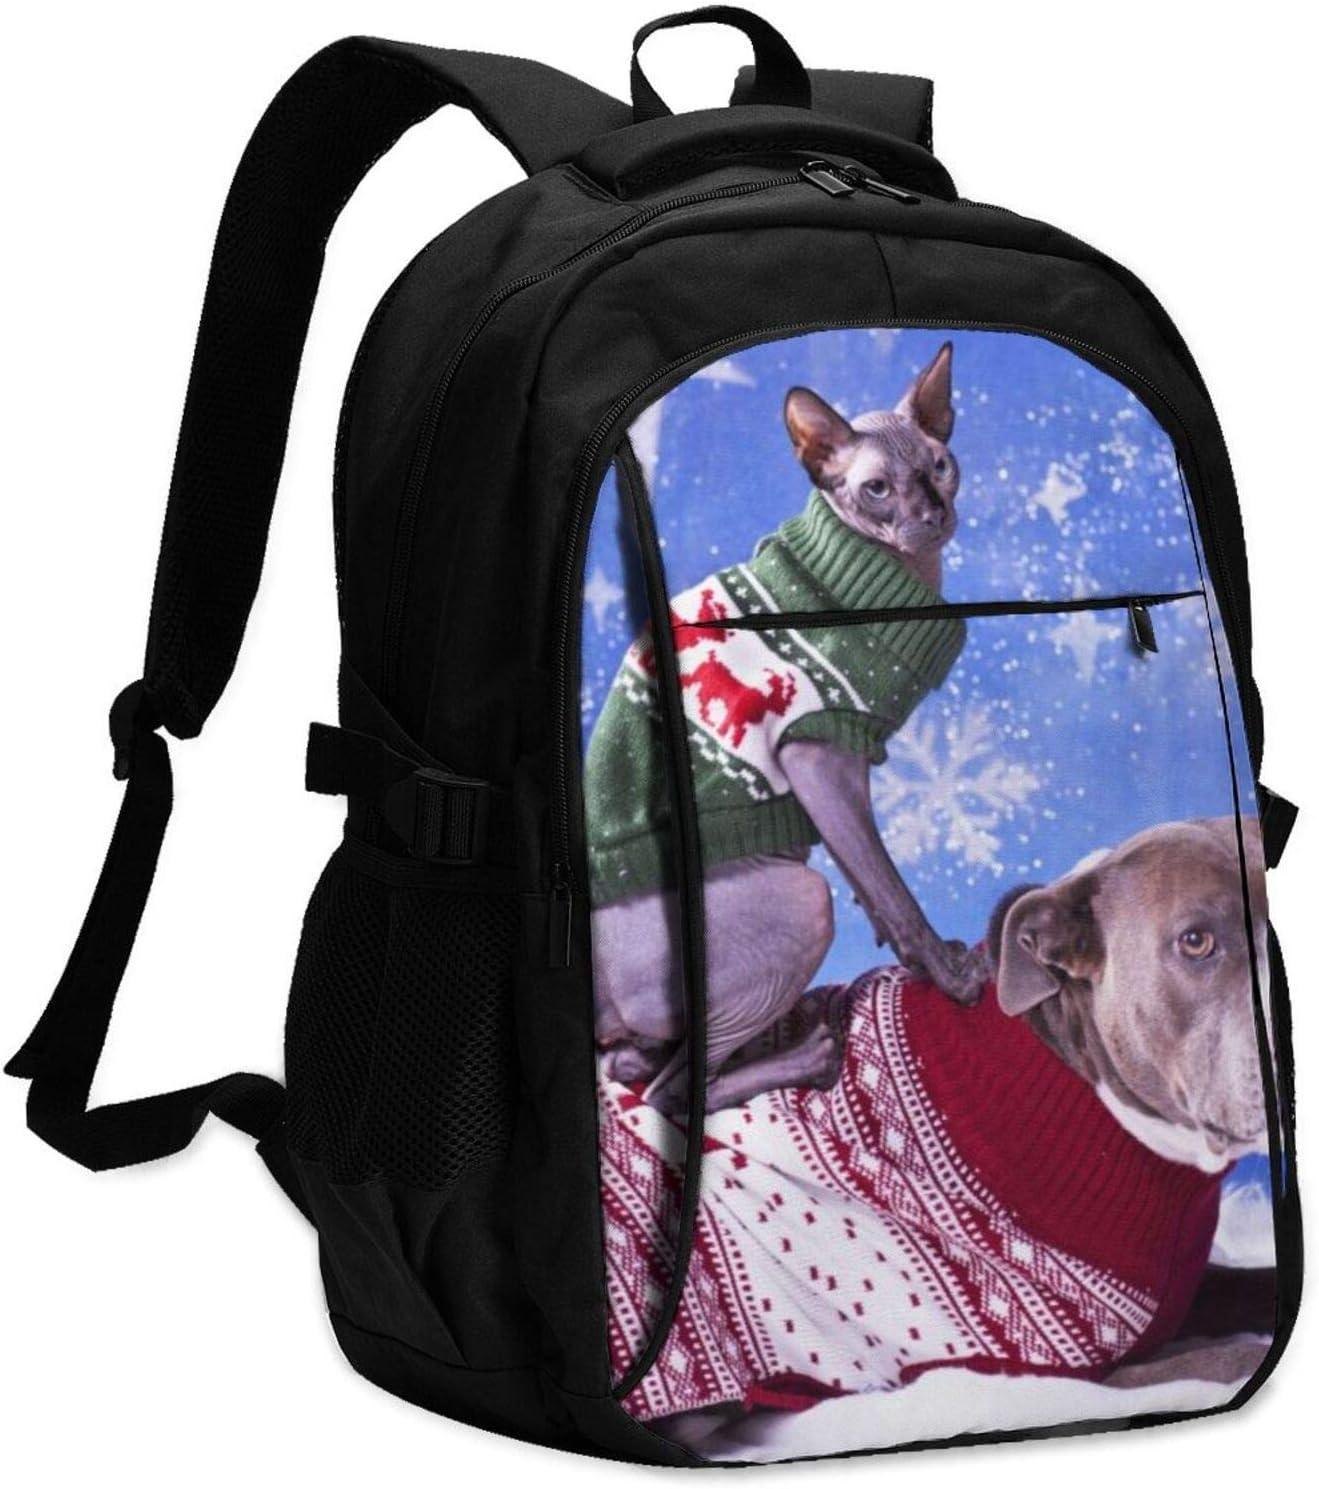 XCNGG Mochila USB con múltiples Bolsillos, Mochila Informal, Mochila Escolar Christmas Pitbull and Sphynx Cat Travel Laptop Backpack with USB Charging Port Multifunction Work School Bag